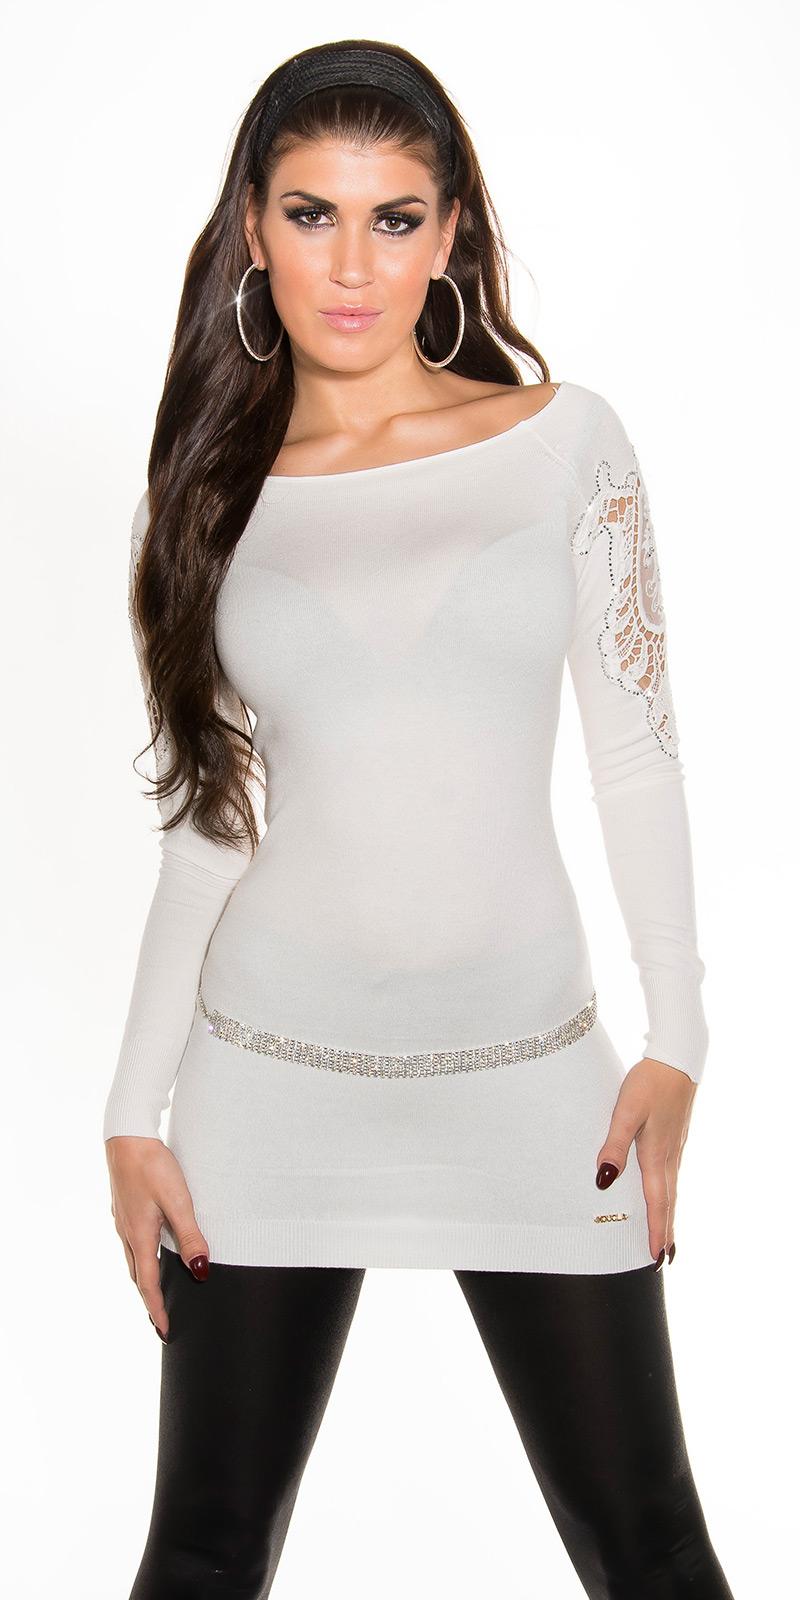 d83146cb18e5 Dámský dlouhý svetr s kamínky Koucla 2416 bílá